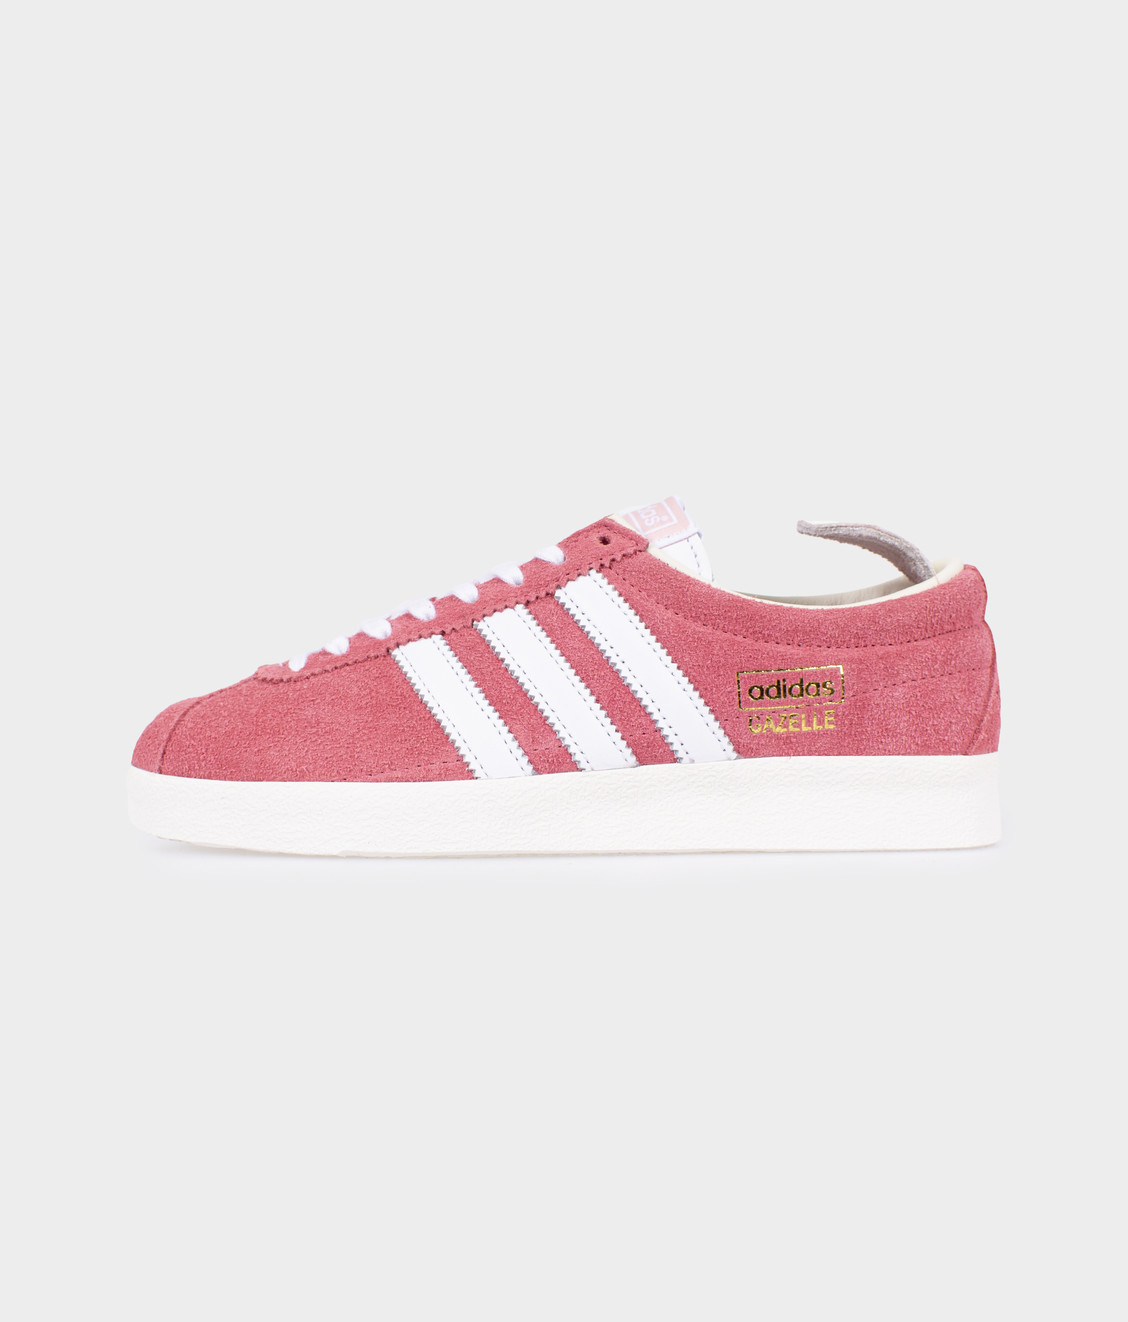 Adidas Adidas Gazelle Vintage Pink